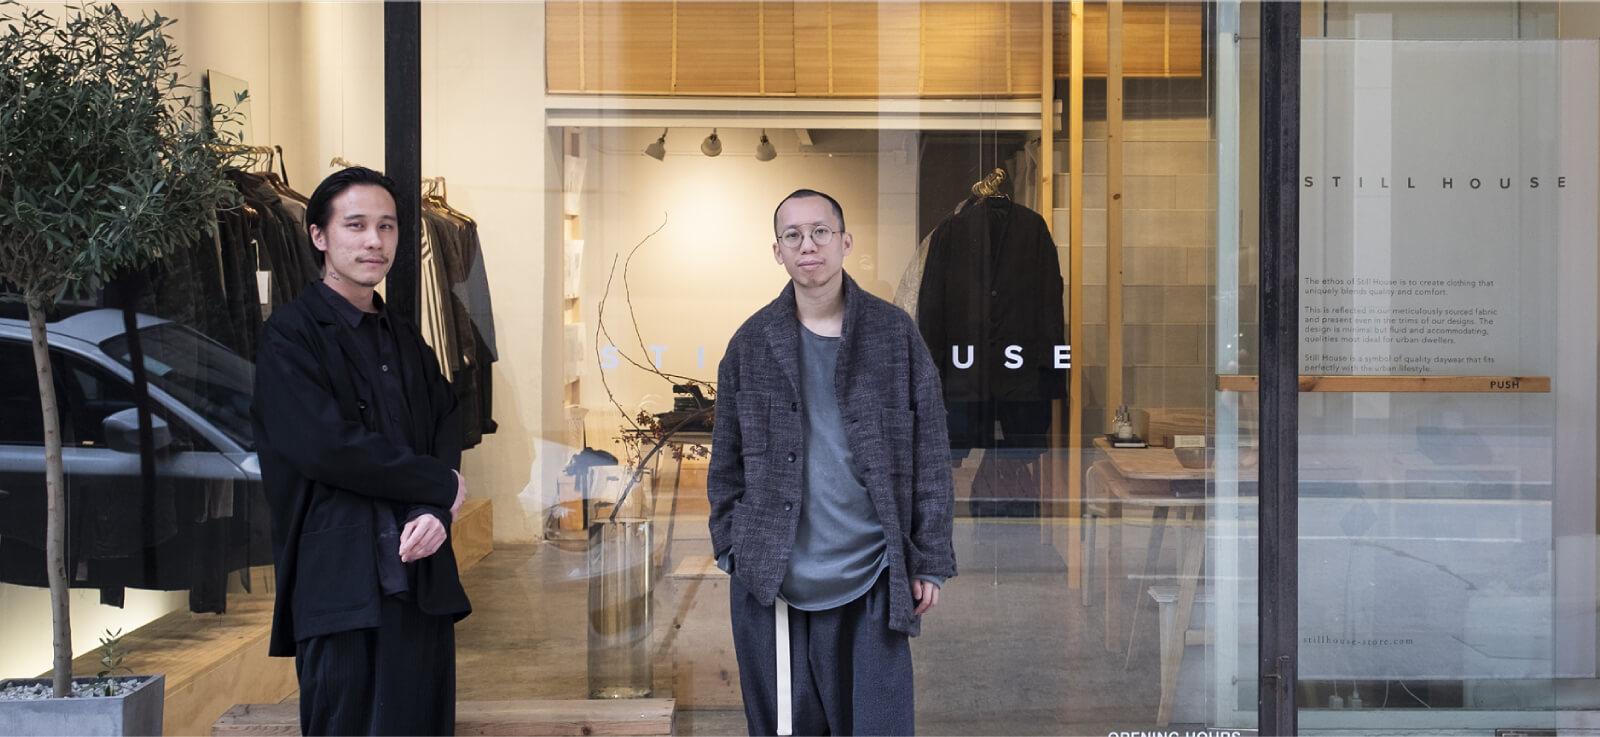 STILL HOUSE主理人阿苗(右)和Jae(左),二人對衣服與生活的關係有共同的理念與看法。